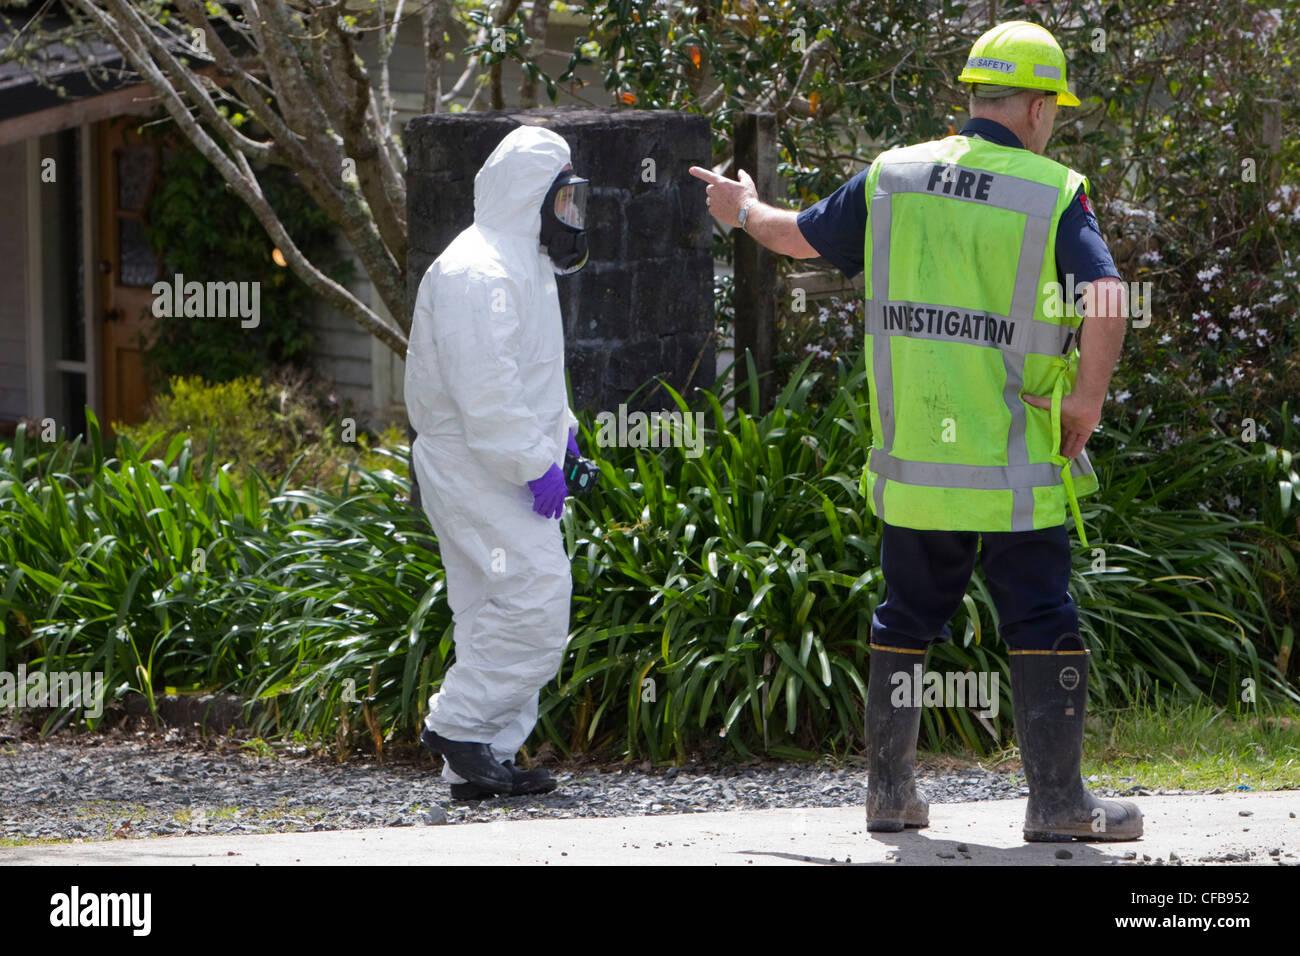 New Zealand Shooting Video Leak Image: Chemical Fire Stock Photos & Chemical Fire Stock Images